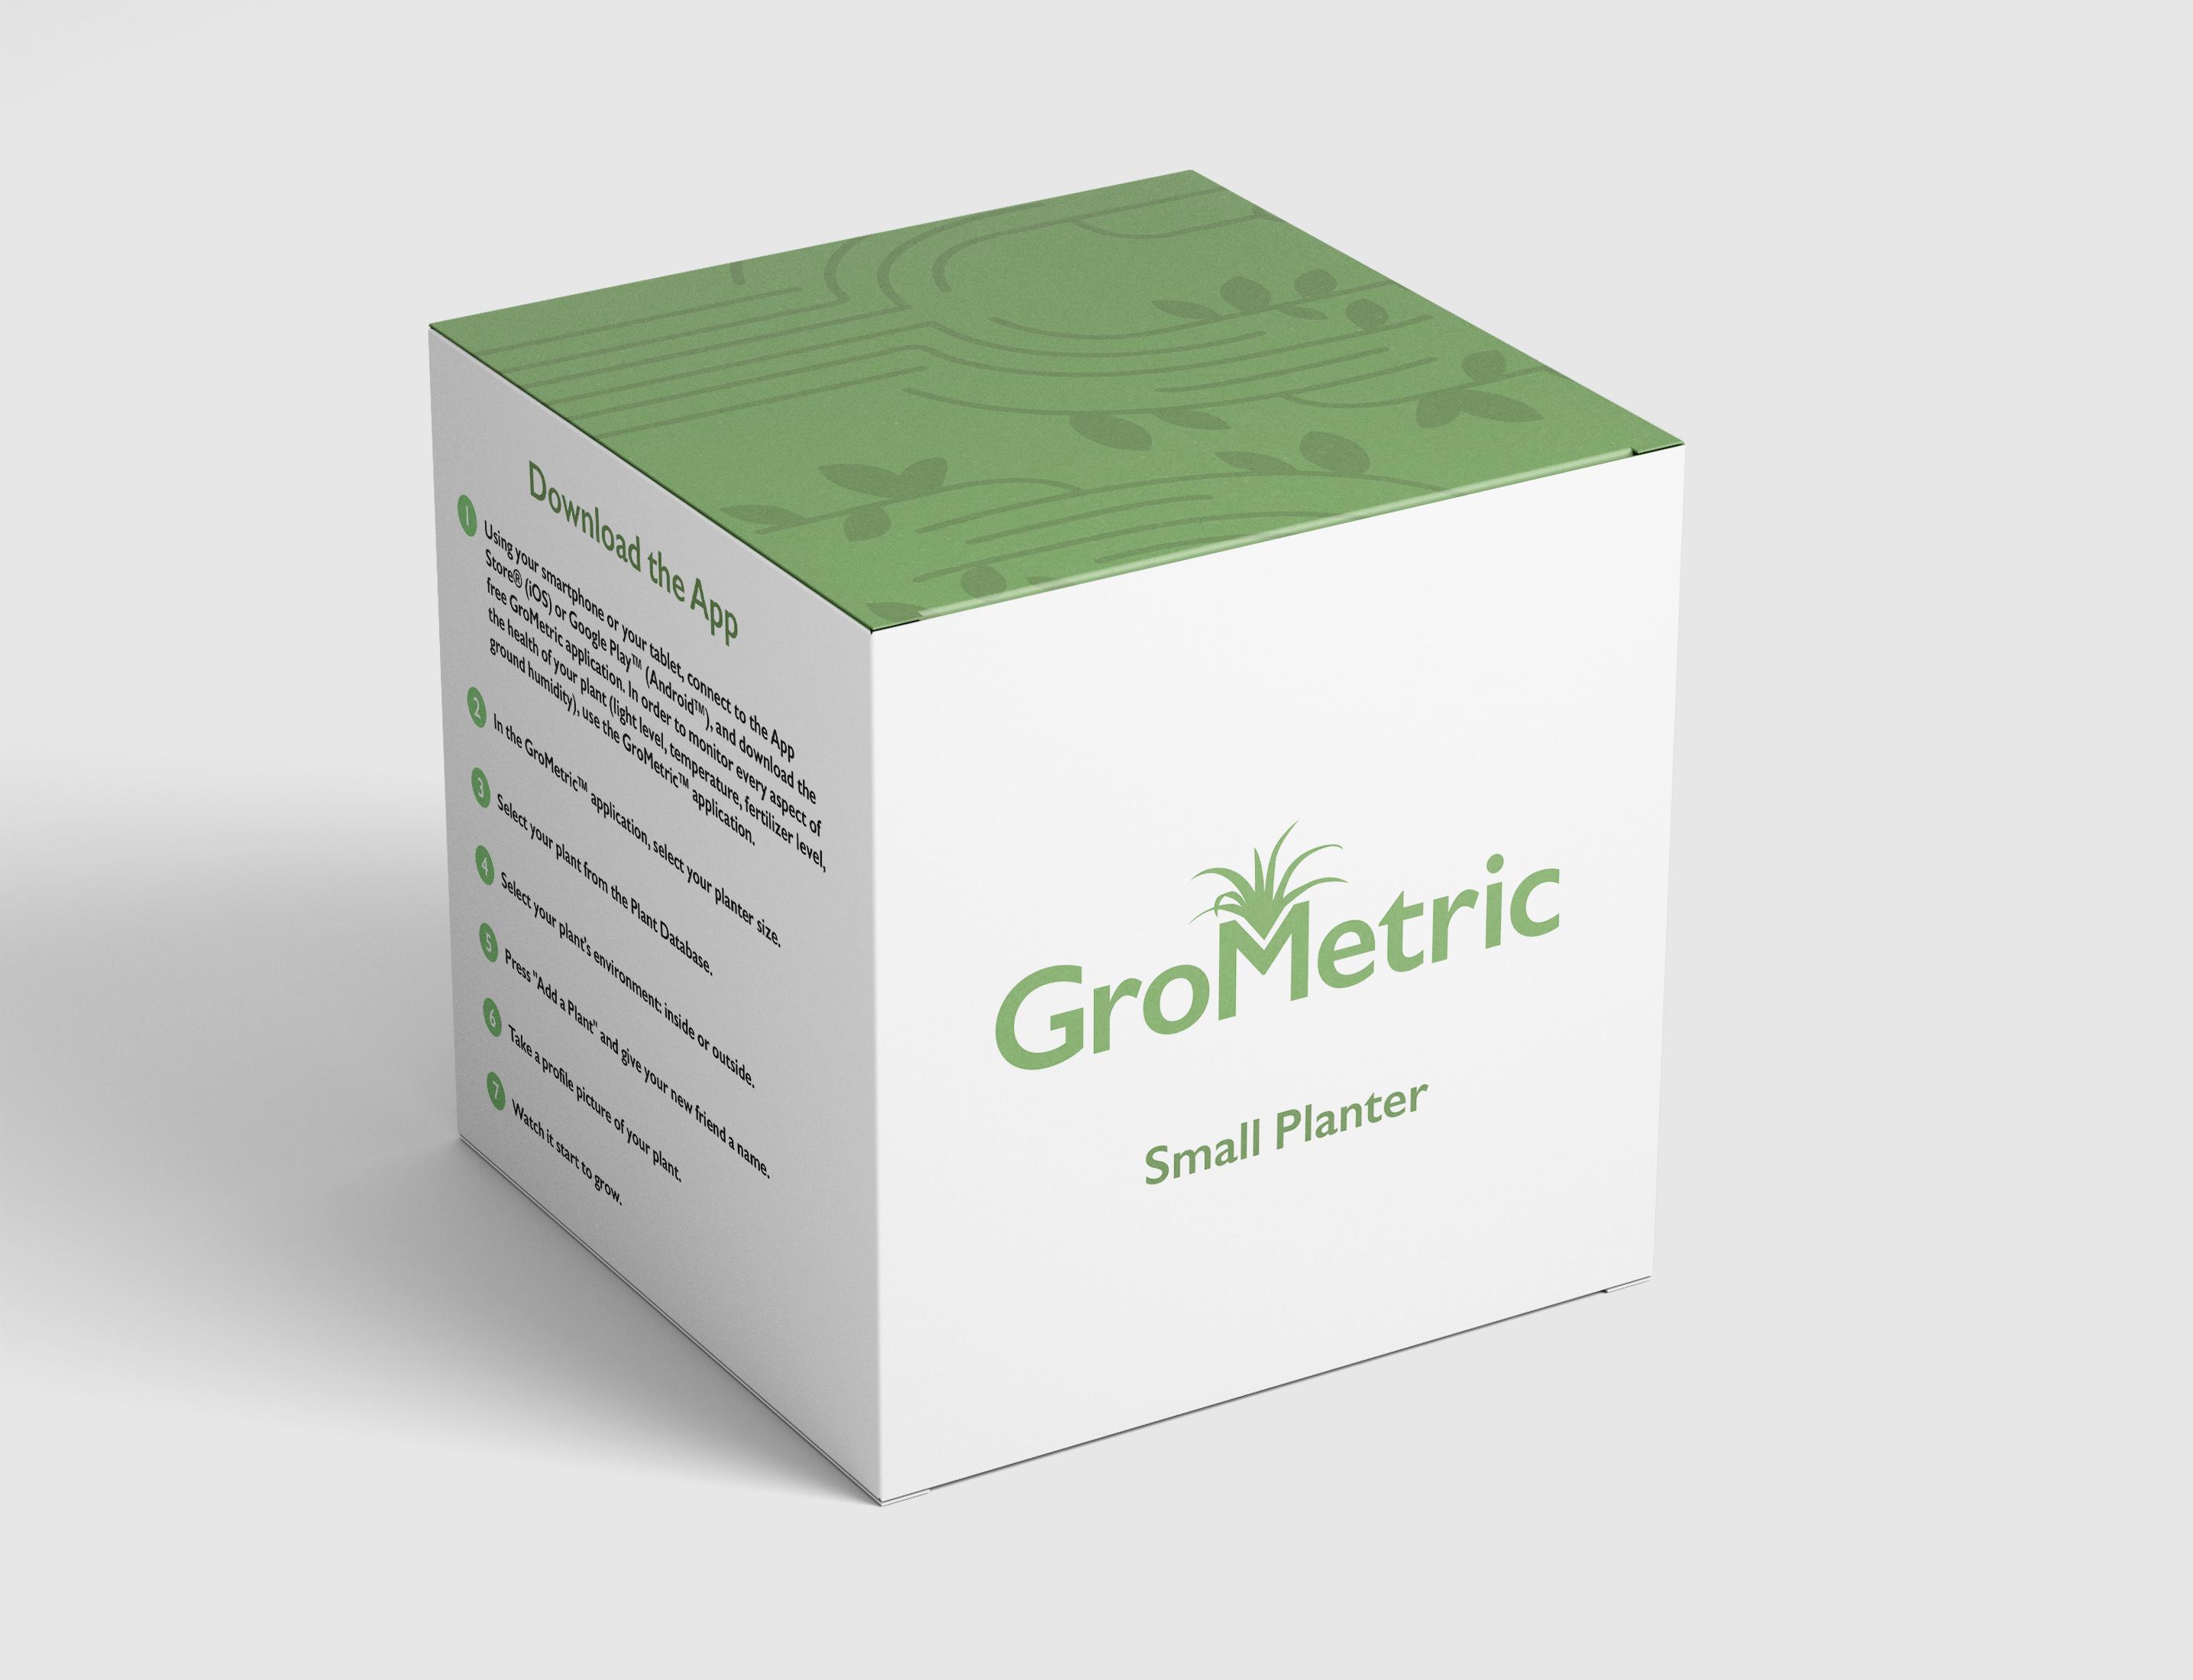 GroMetric Planter Package